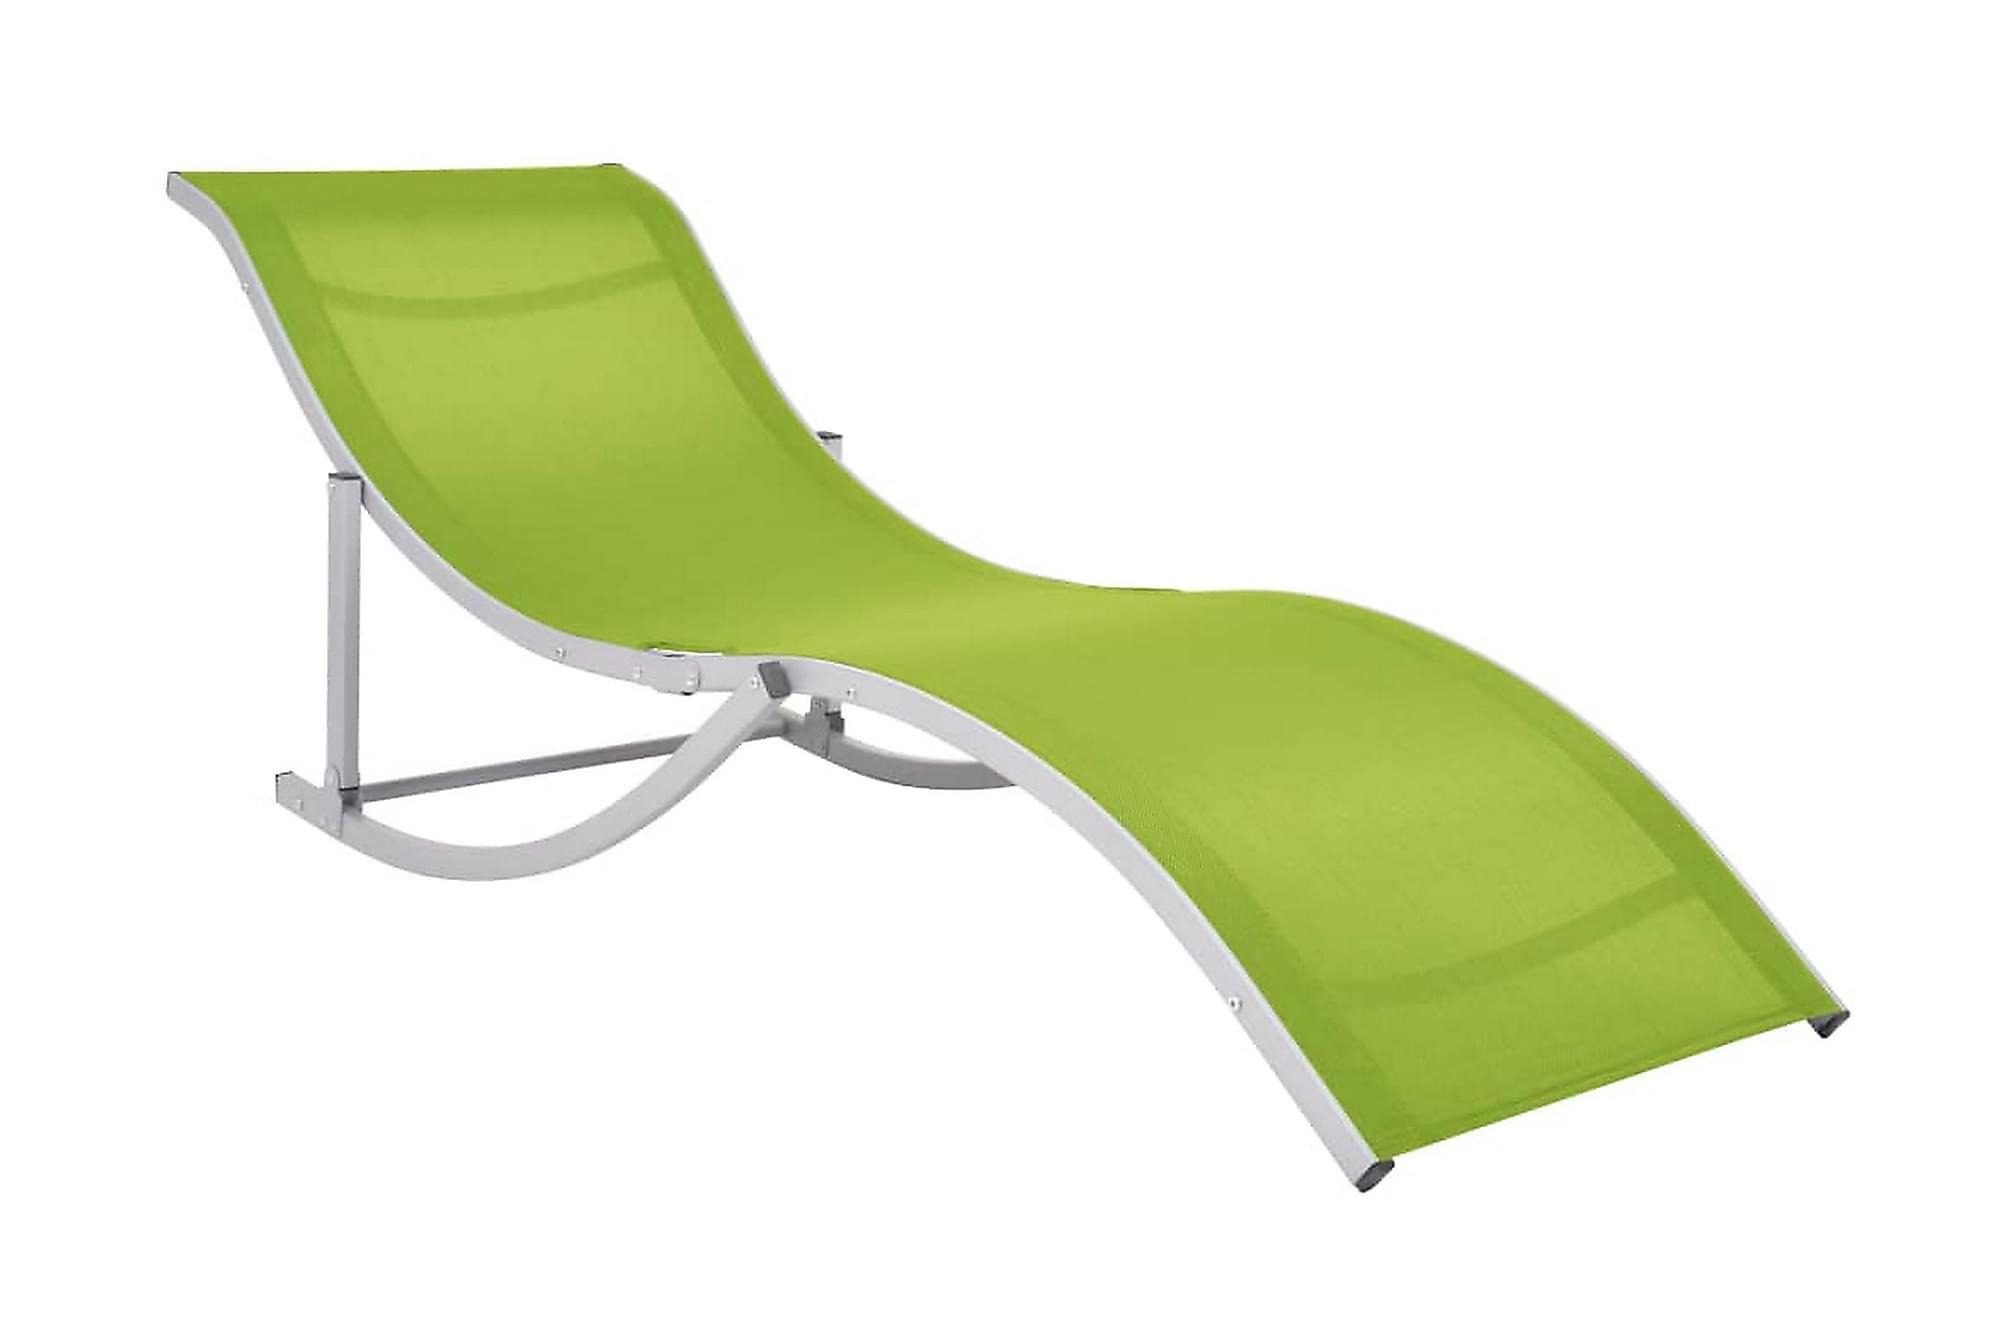 Hopfällbara solsängar 2 st grön textilene, Solsängar & solvagnar